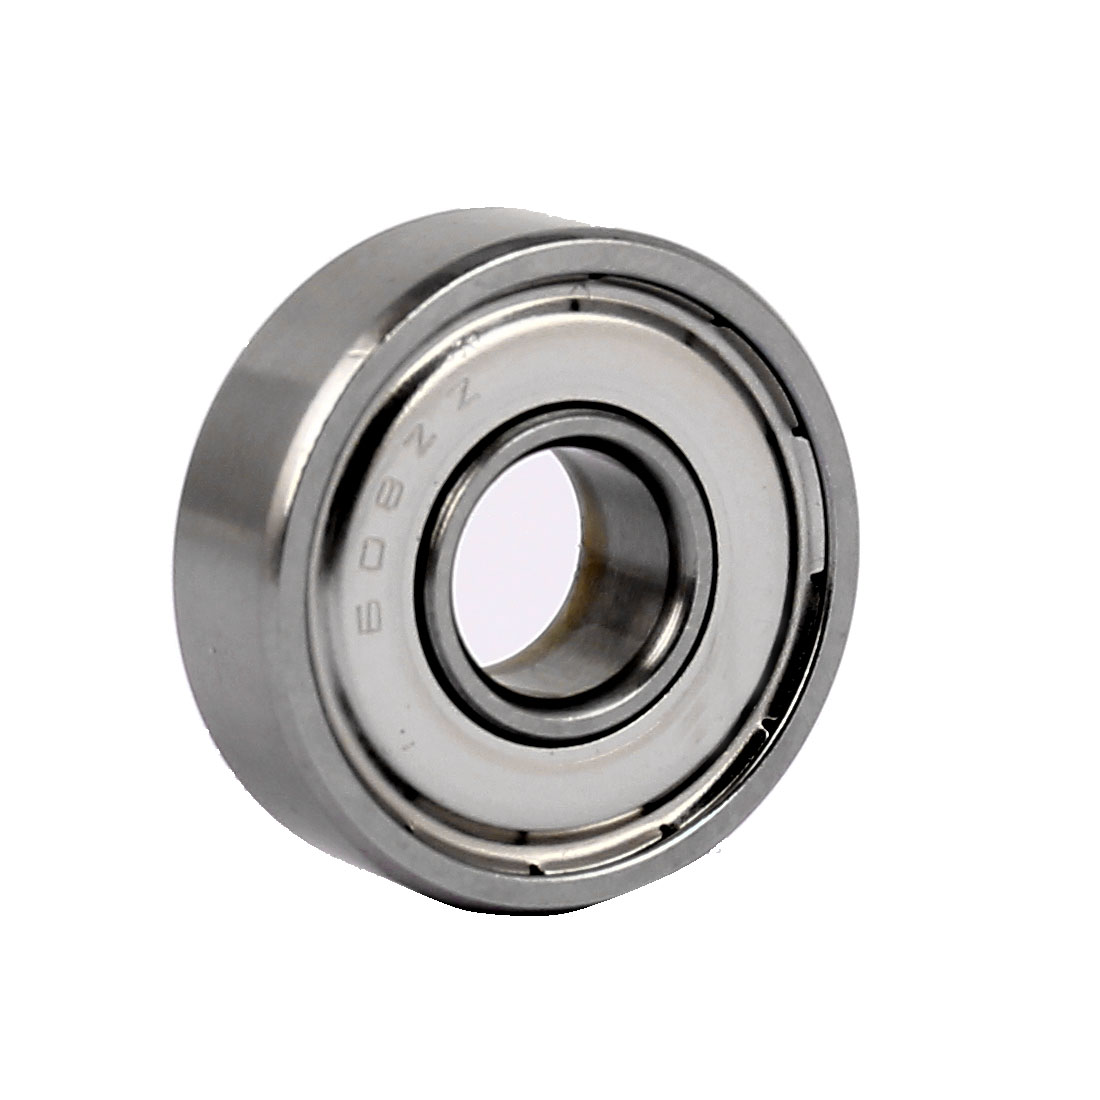 ZZ608 Shielded Deep Groove Flange Ball Bearing 22mm OD 8mm Bore Diameter